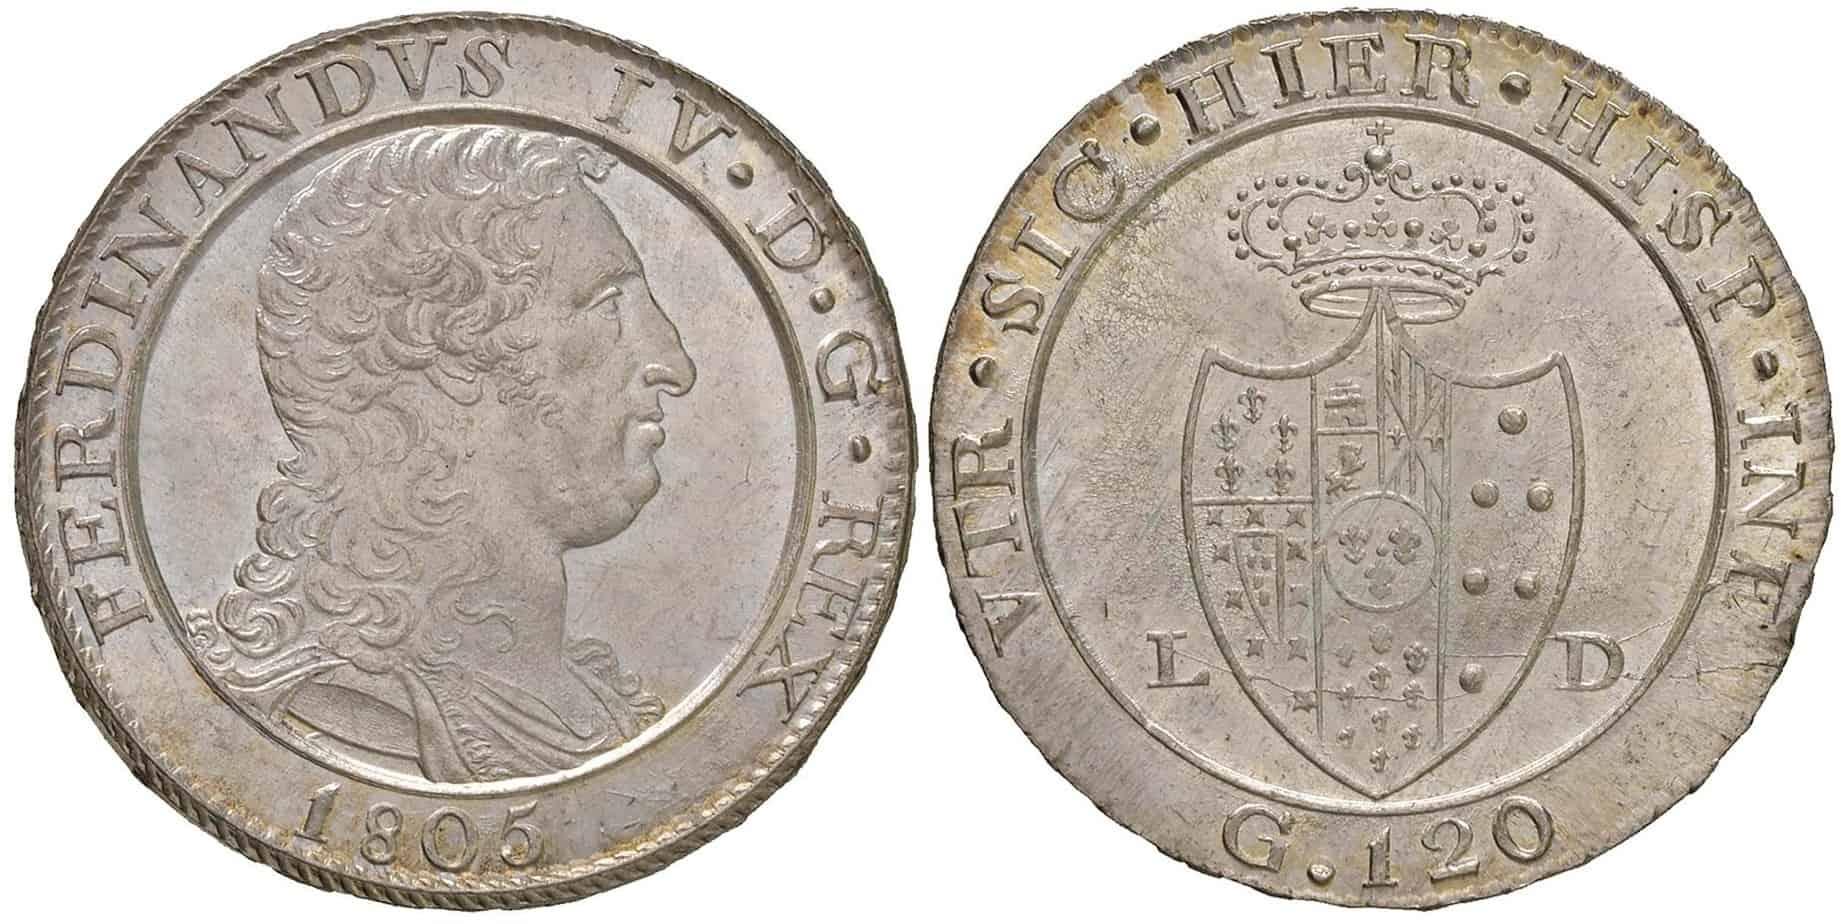 120 grana de 1805, Nápoles